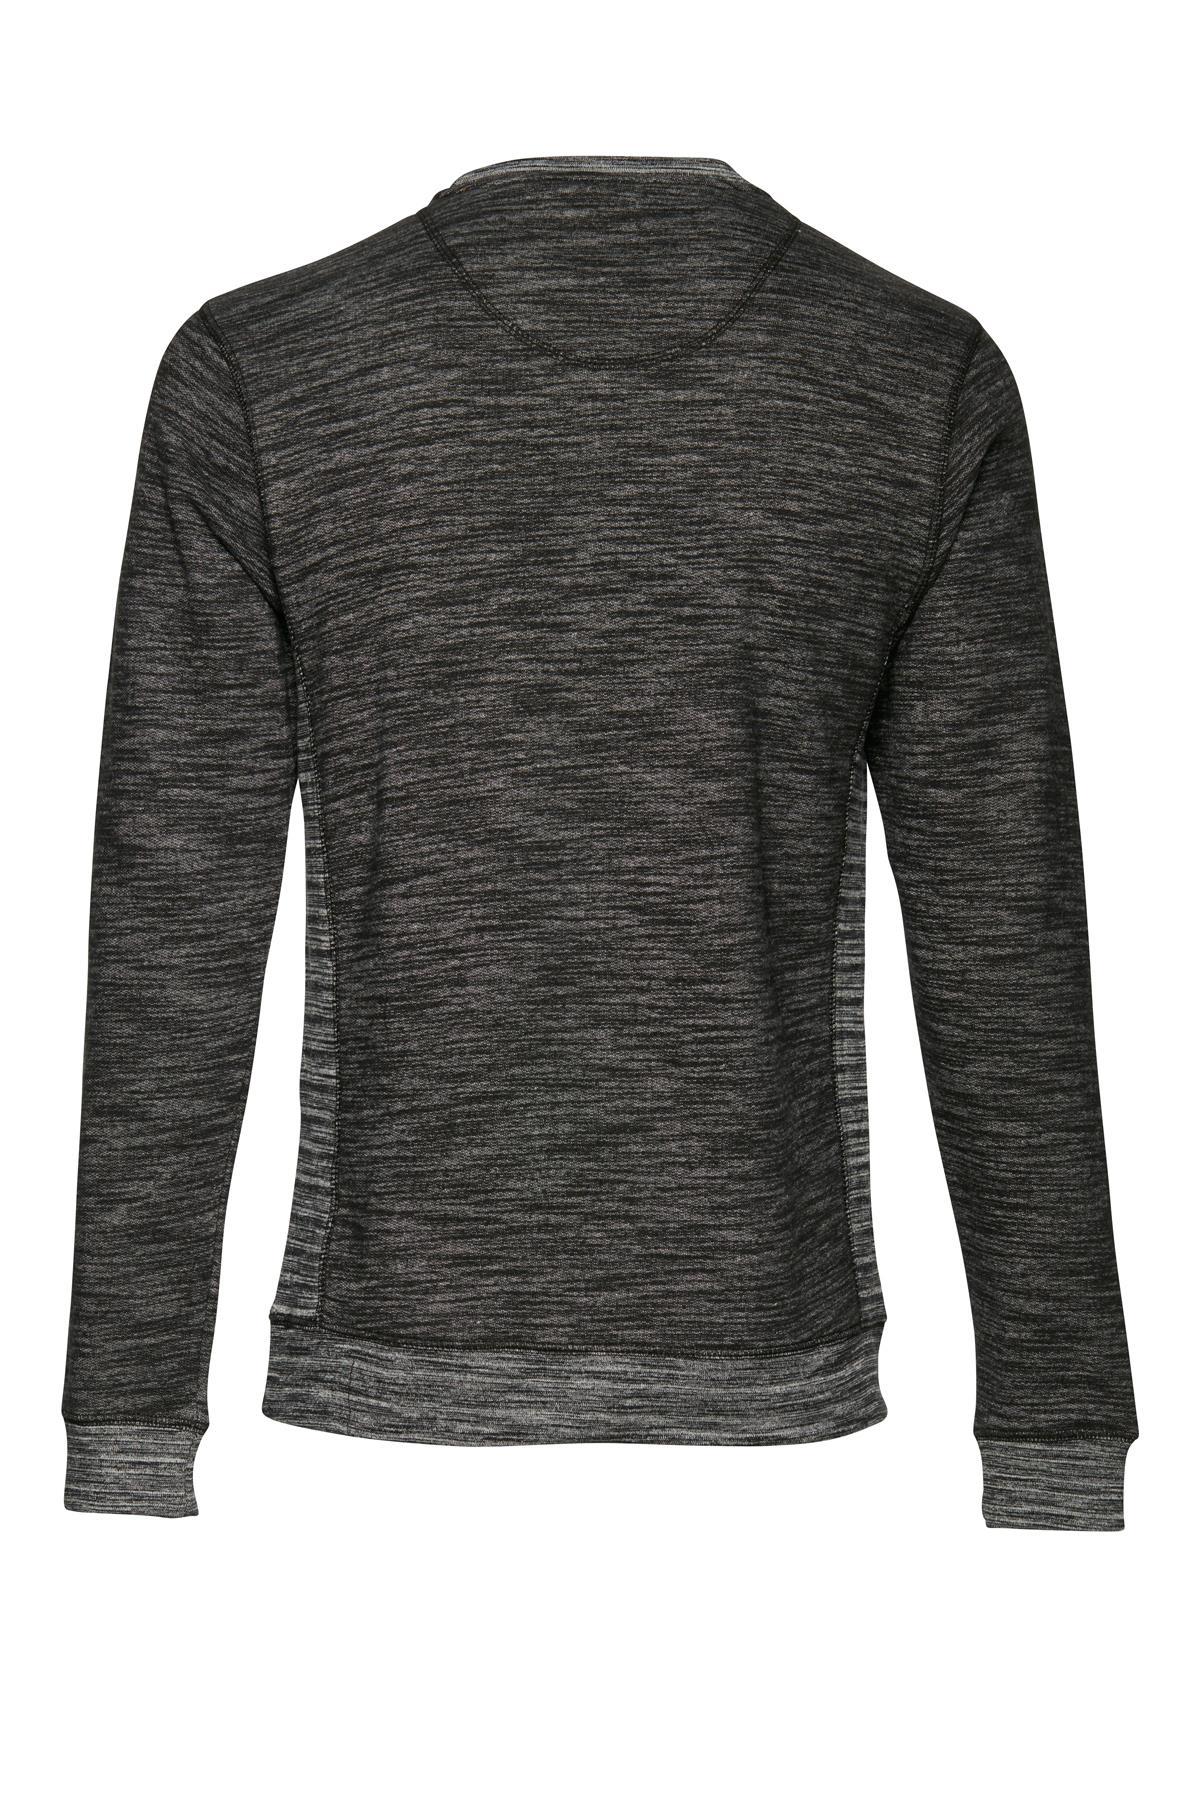 Koksgrå Sweatshirt – Køb Koksgrå Sweatshirt fra str. S-XL her